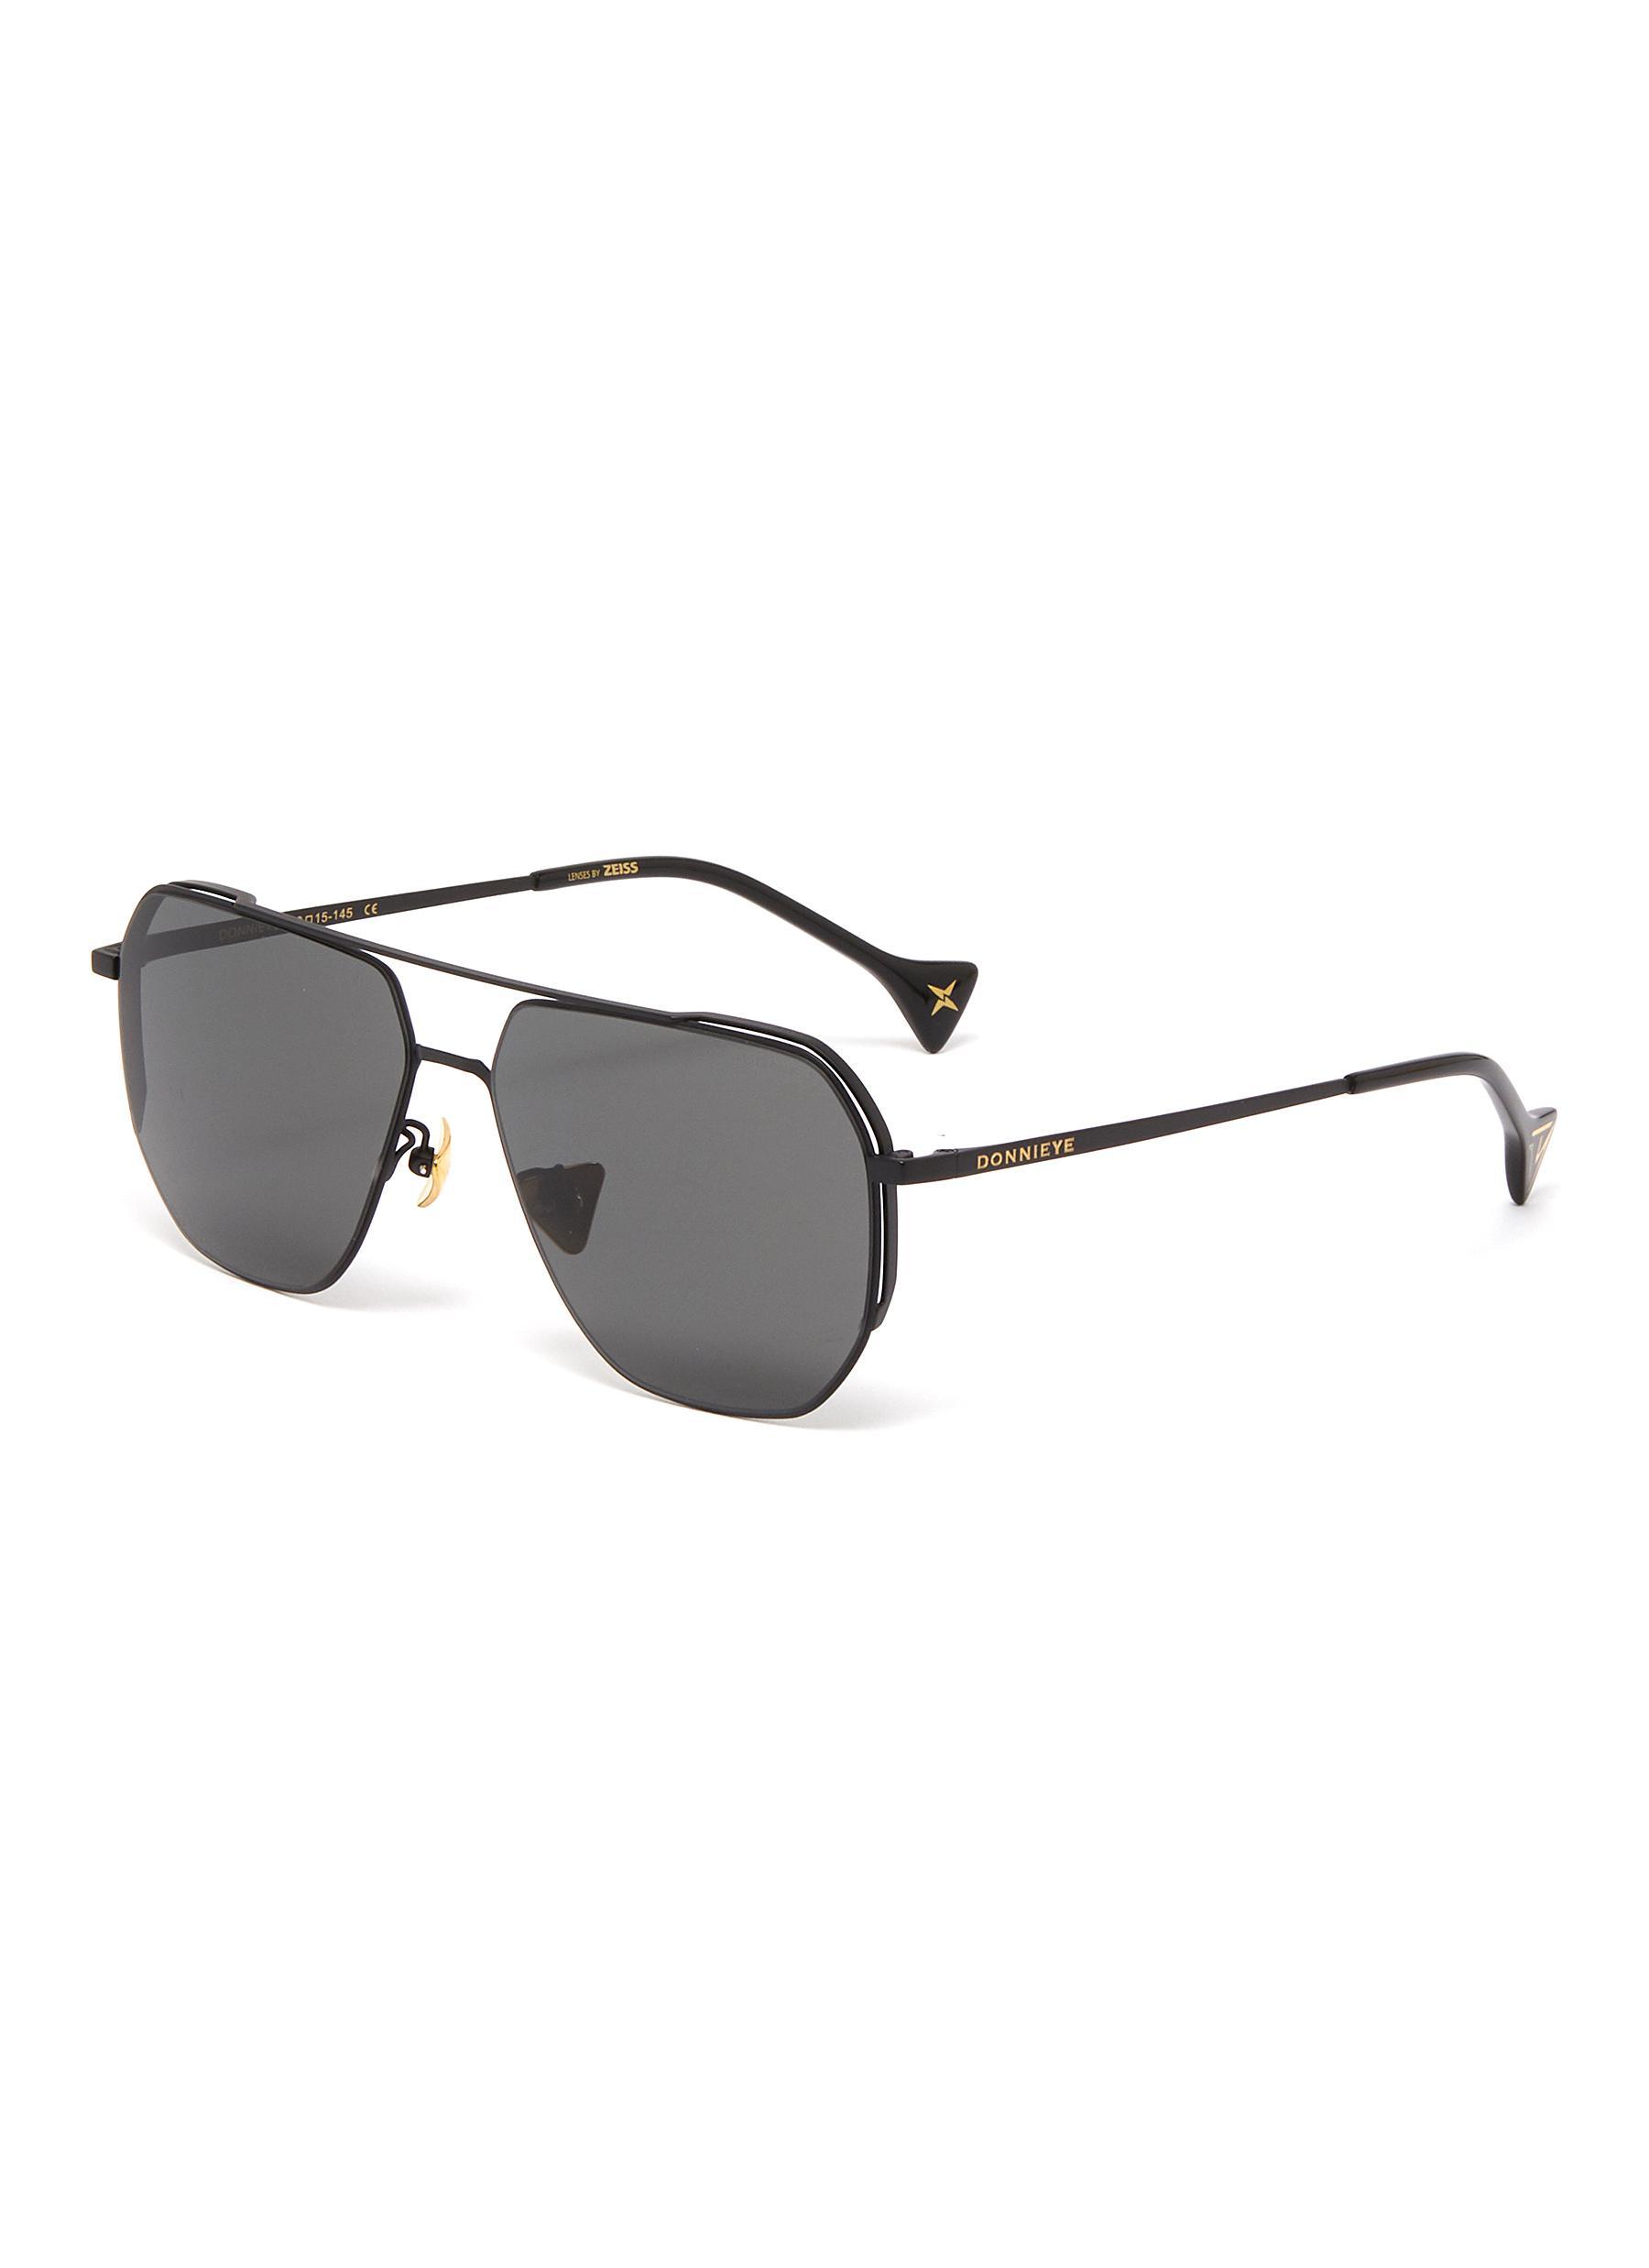 'Sagacious' metal frame aviator sunglasses